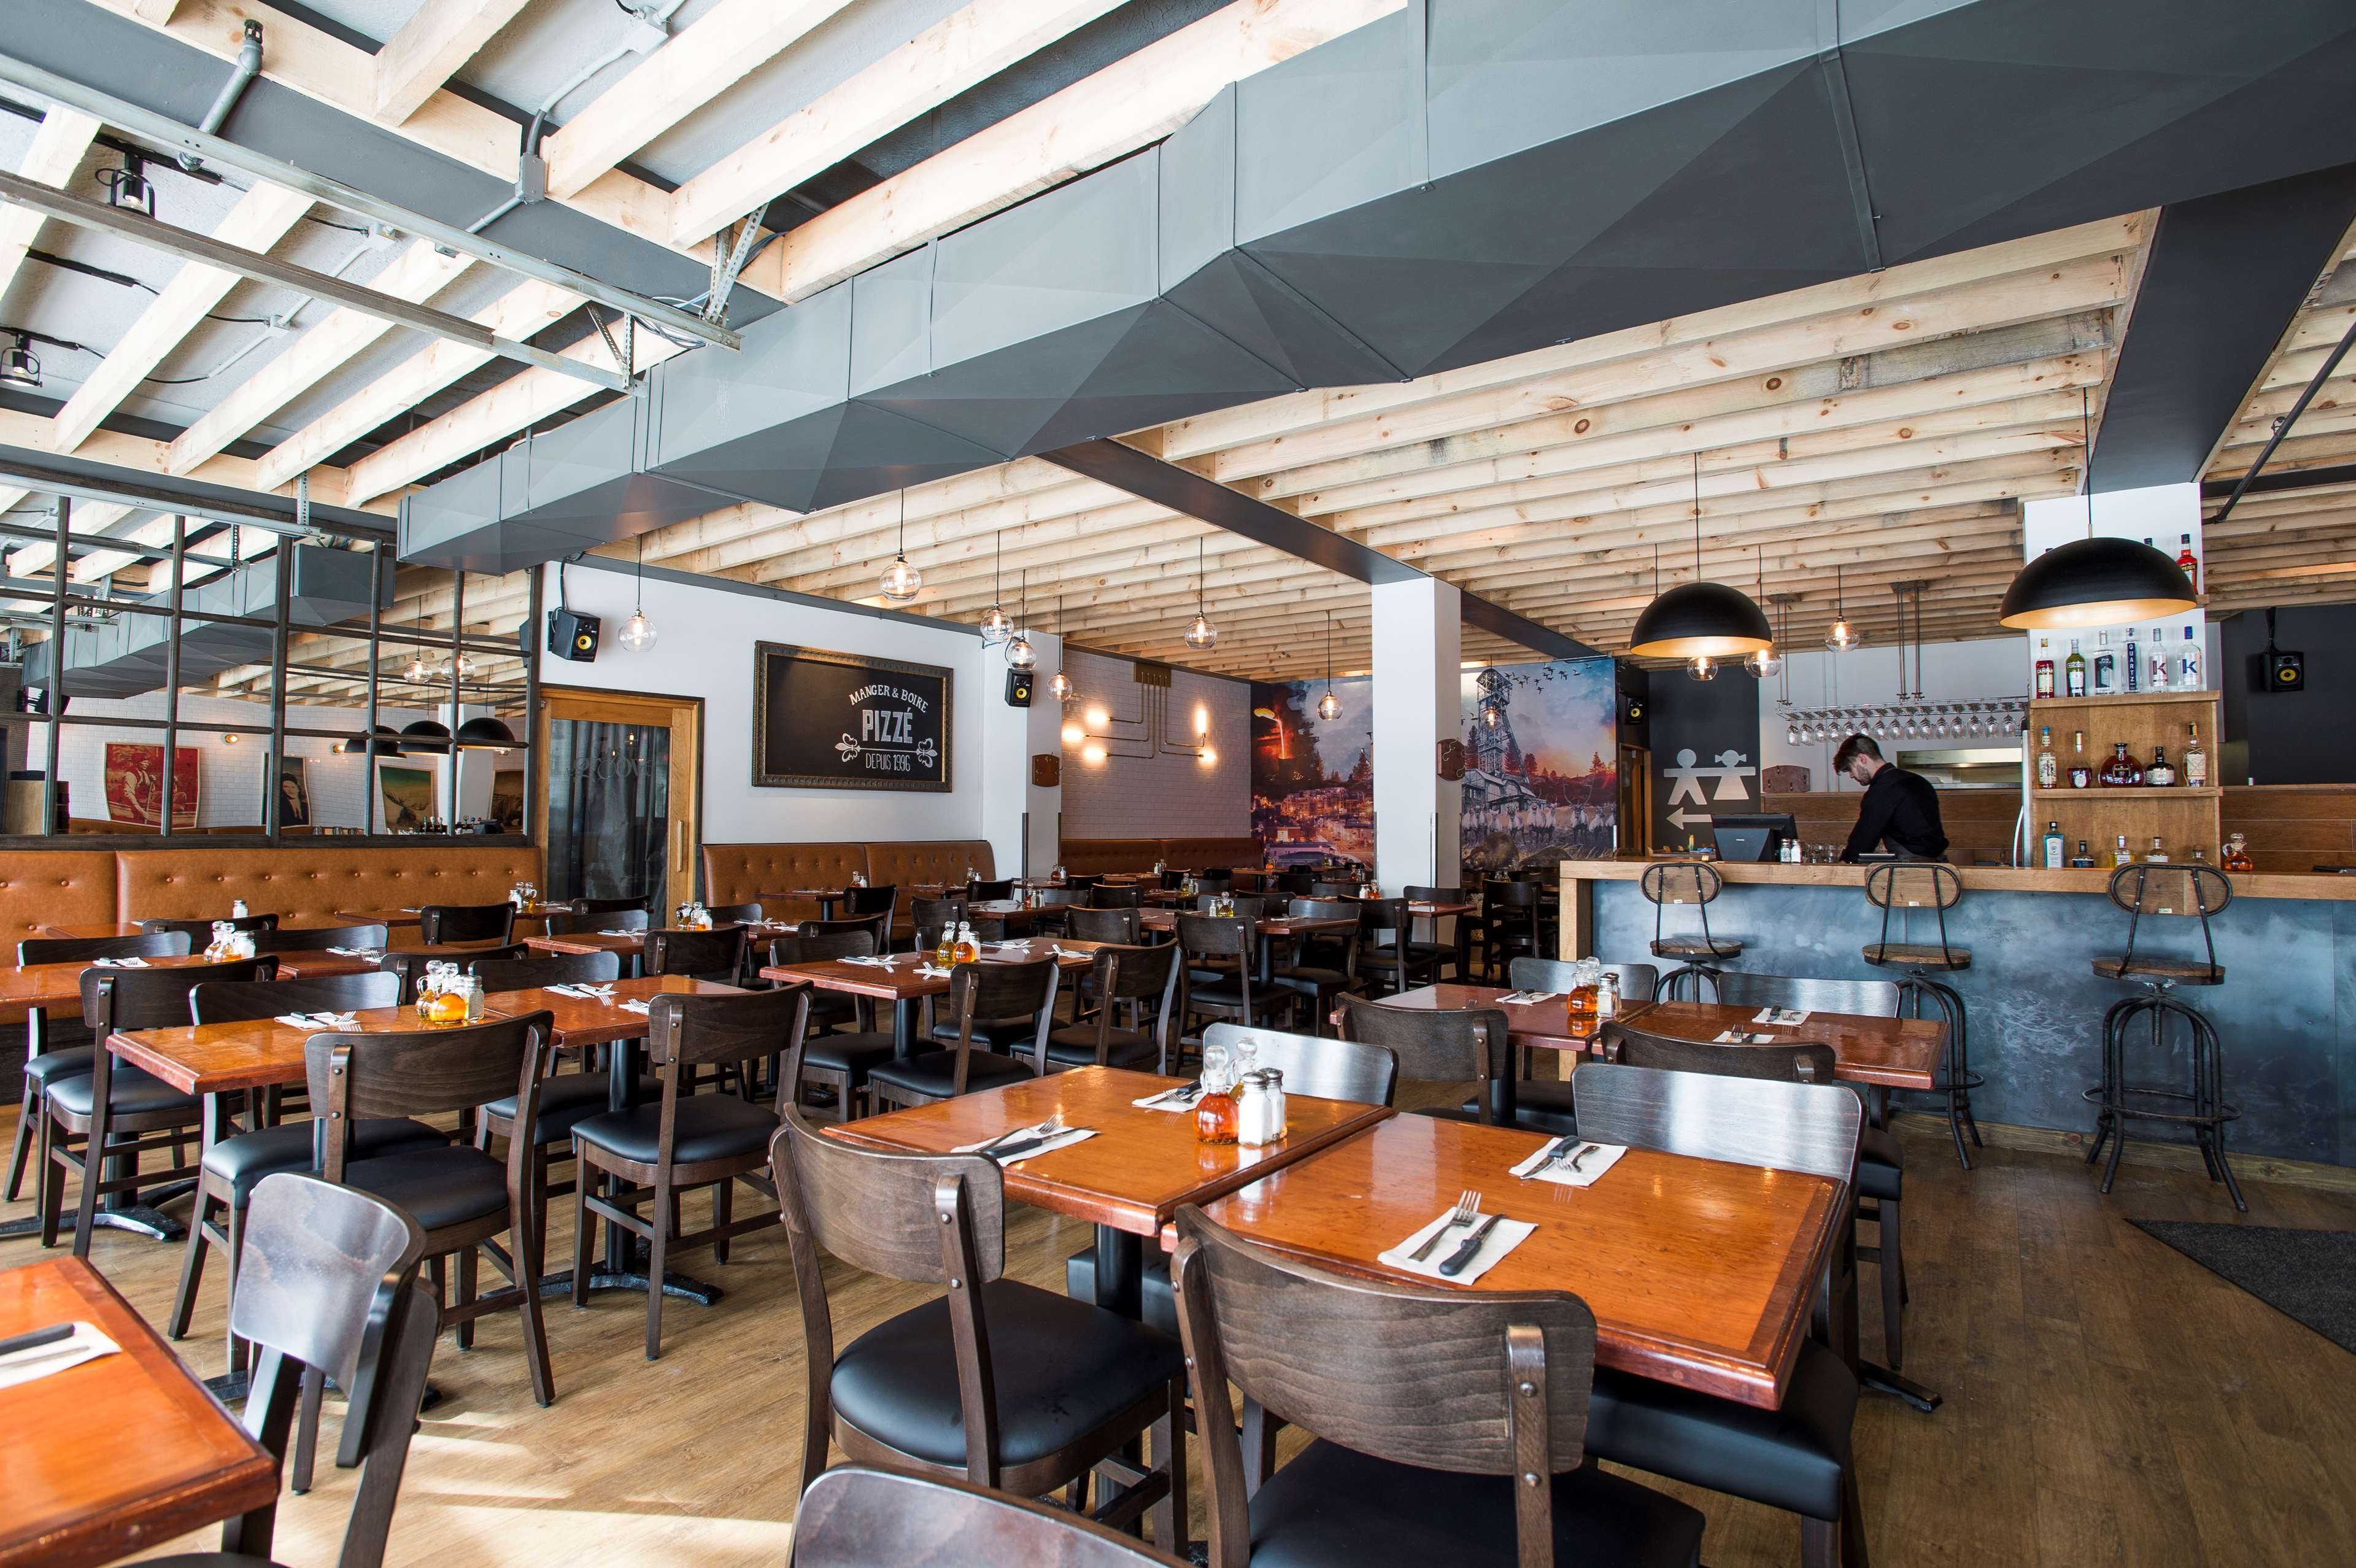 Best Western Plus Hotel Albert Rouyn-Noranda à Rouyn-Noranda: Restaurant